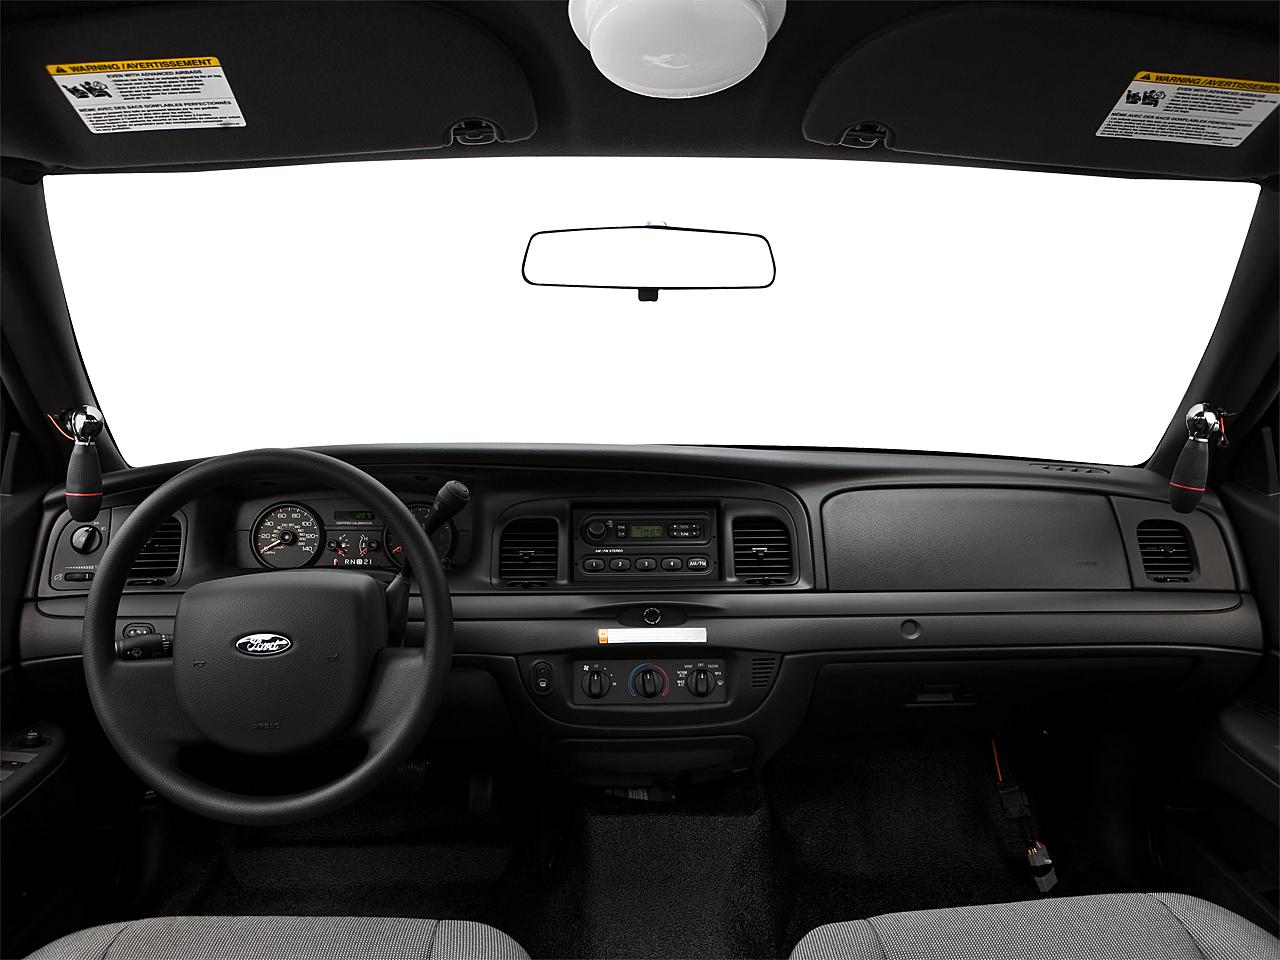 2009 Ford Crown Victoria Police Interceptor 4dr Sedan (3 55